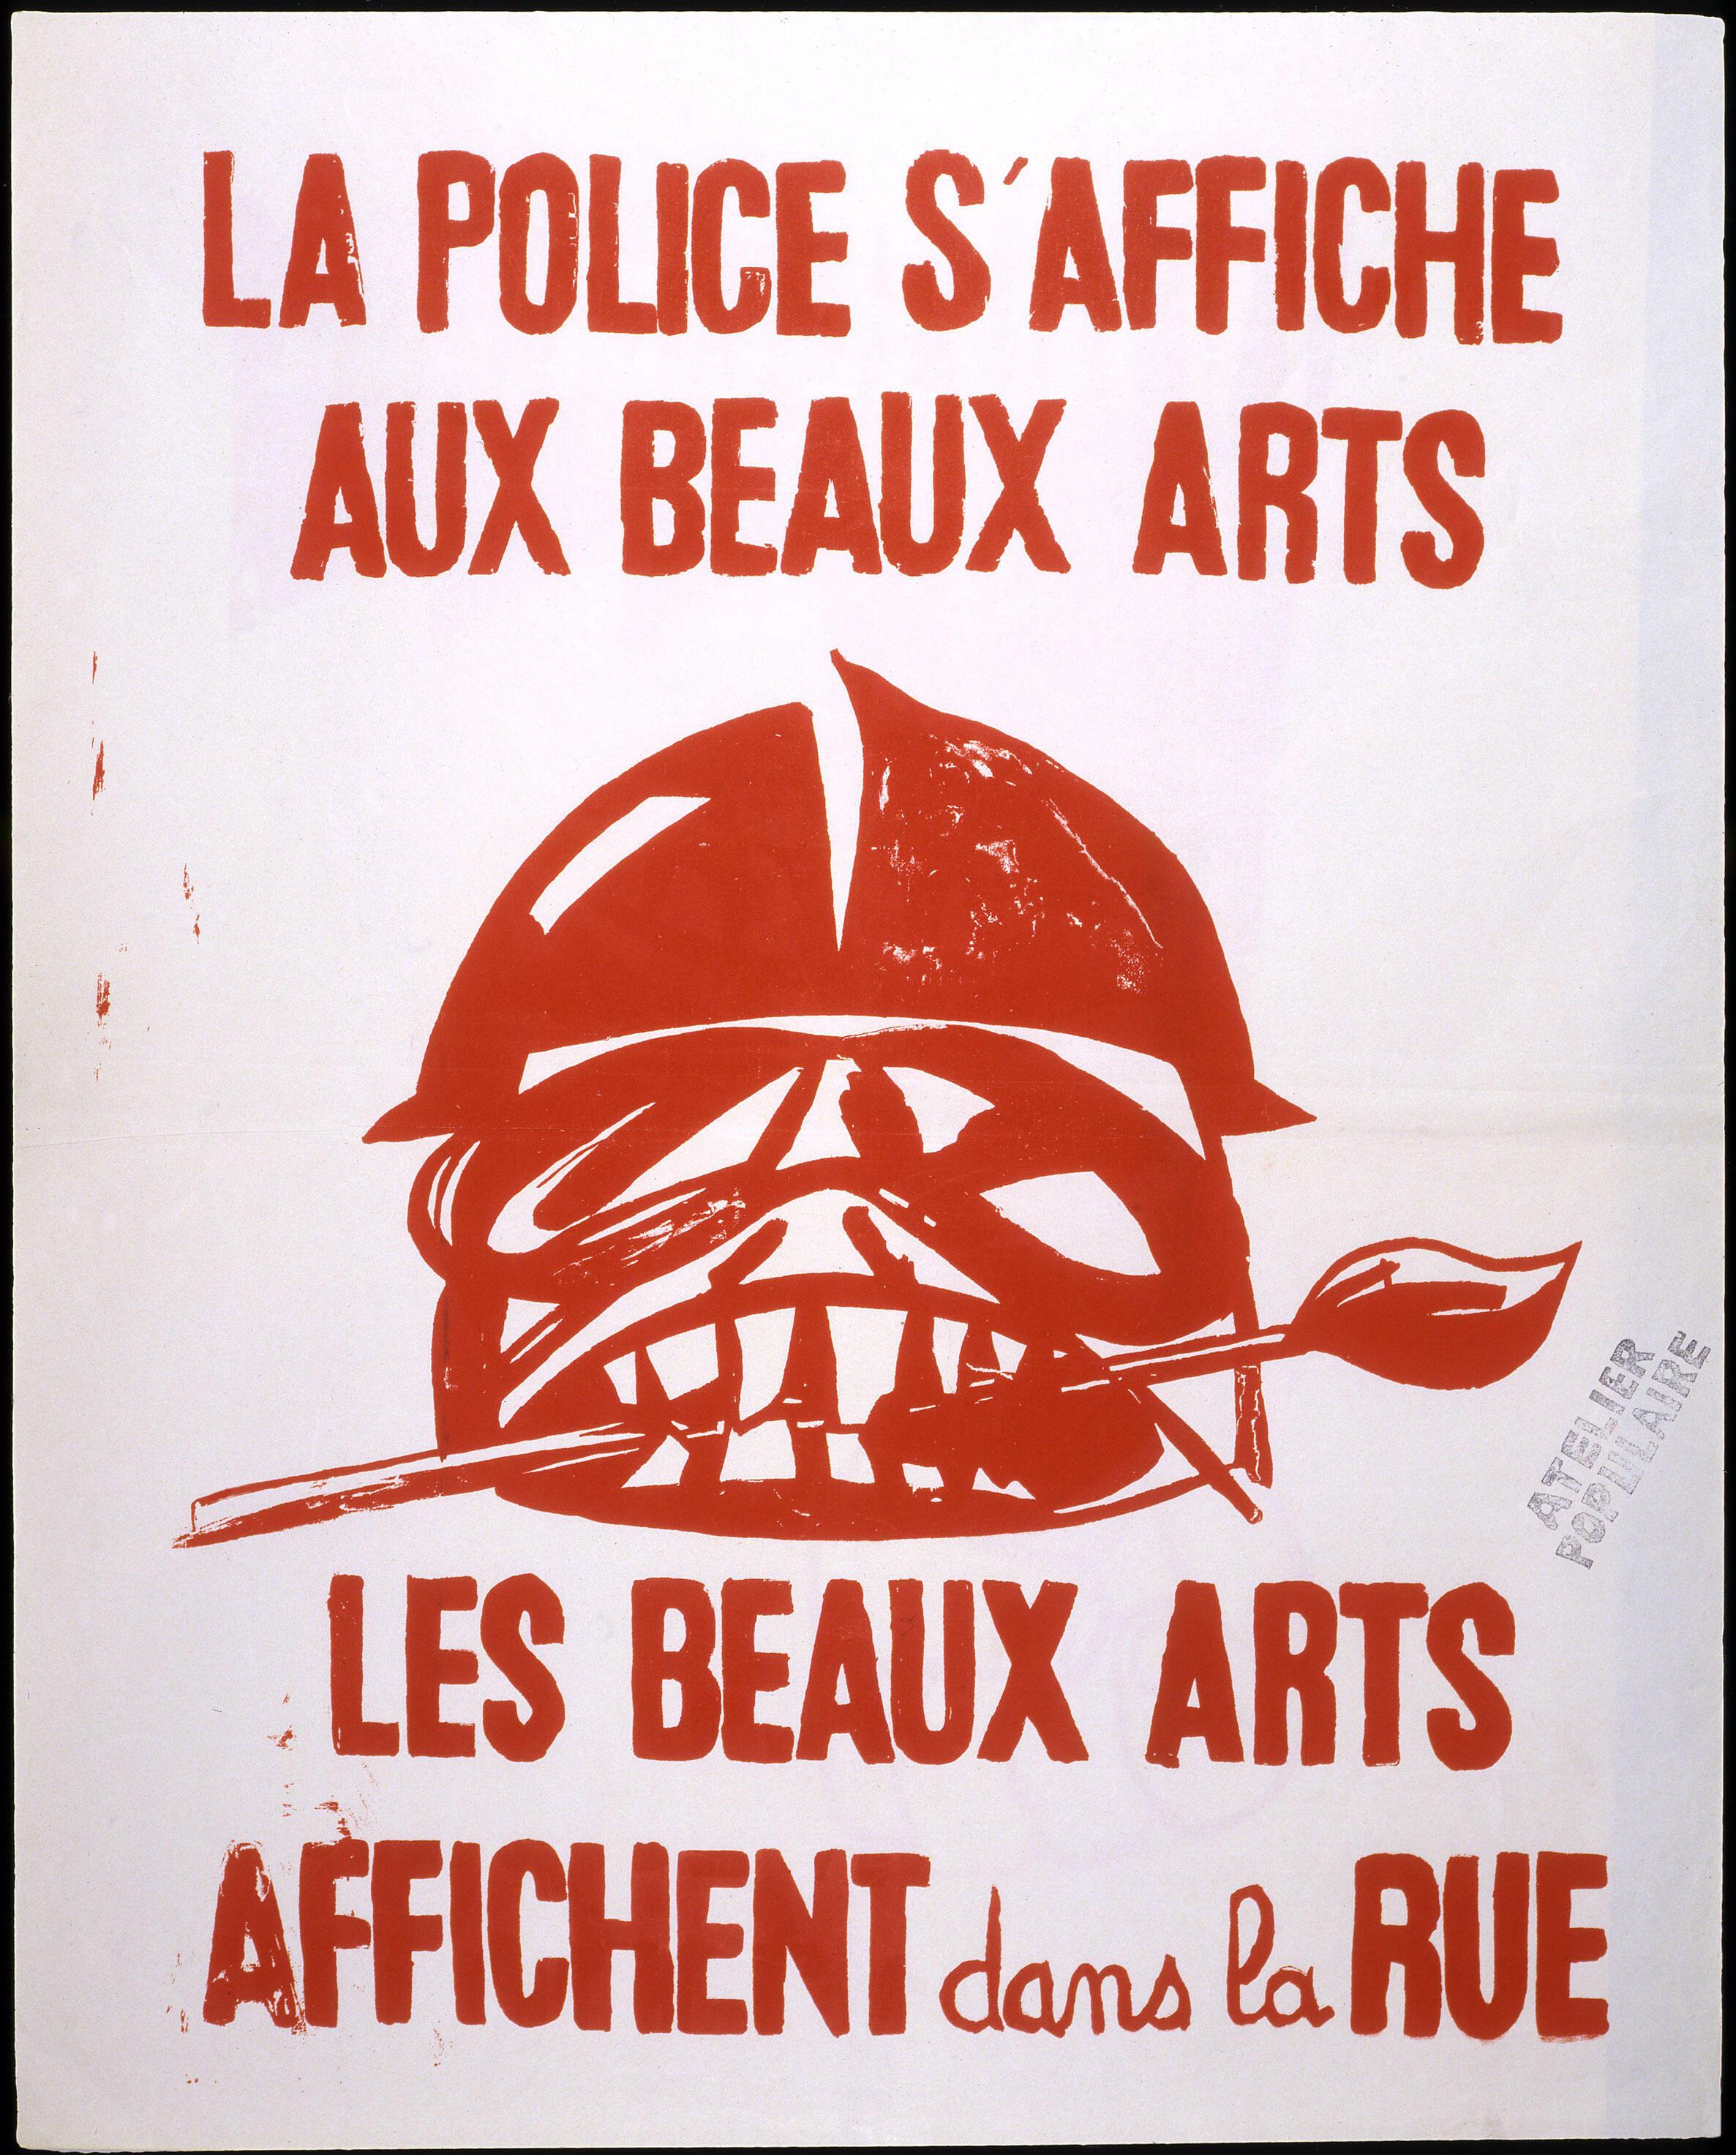 Cartaz feito por alunos da Escola de Belas Artes de Paris.